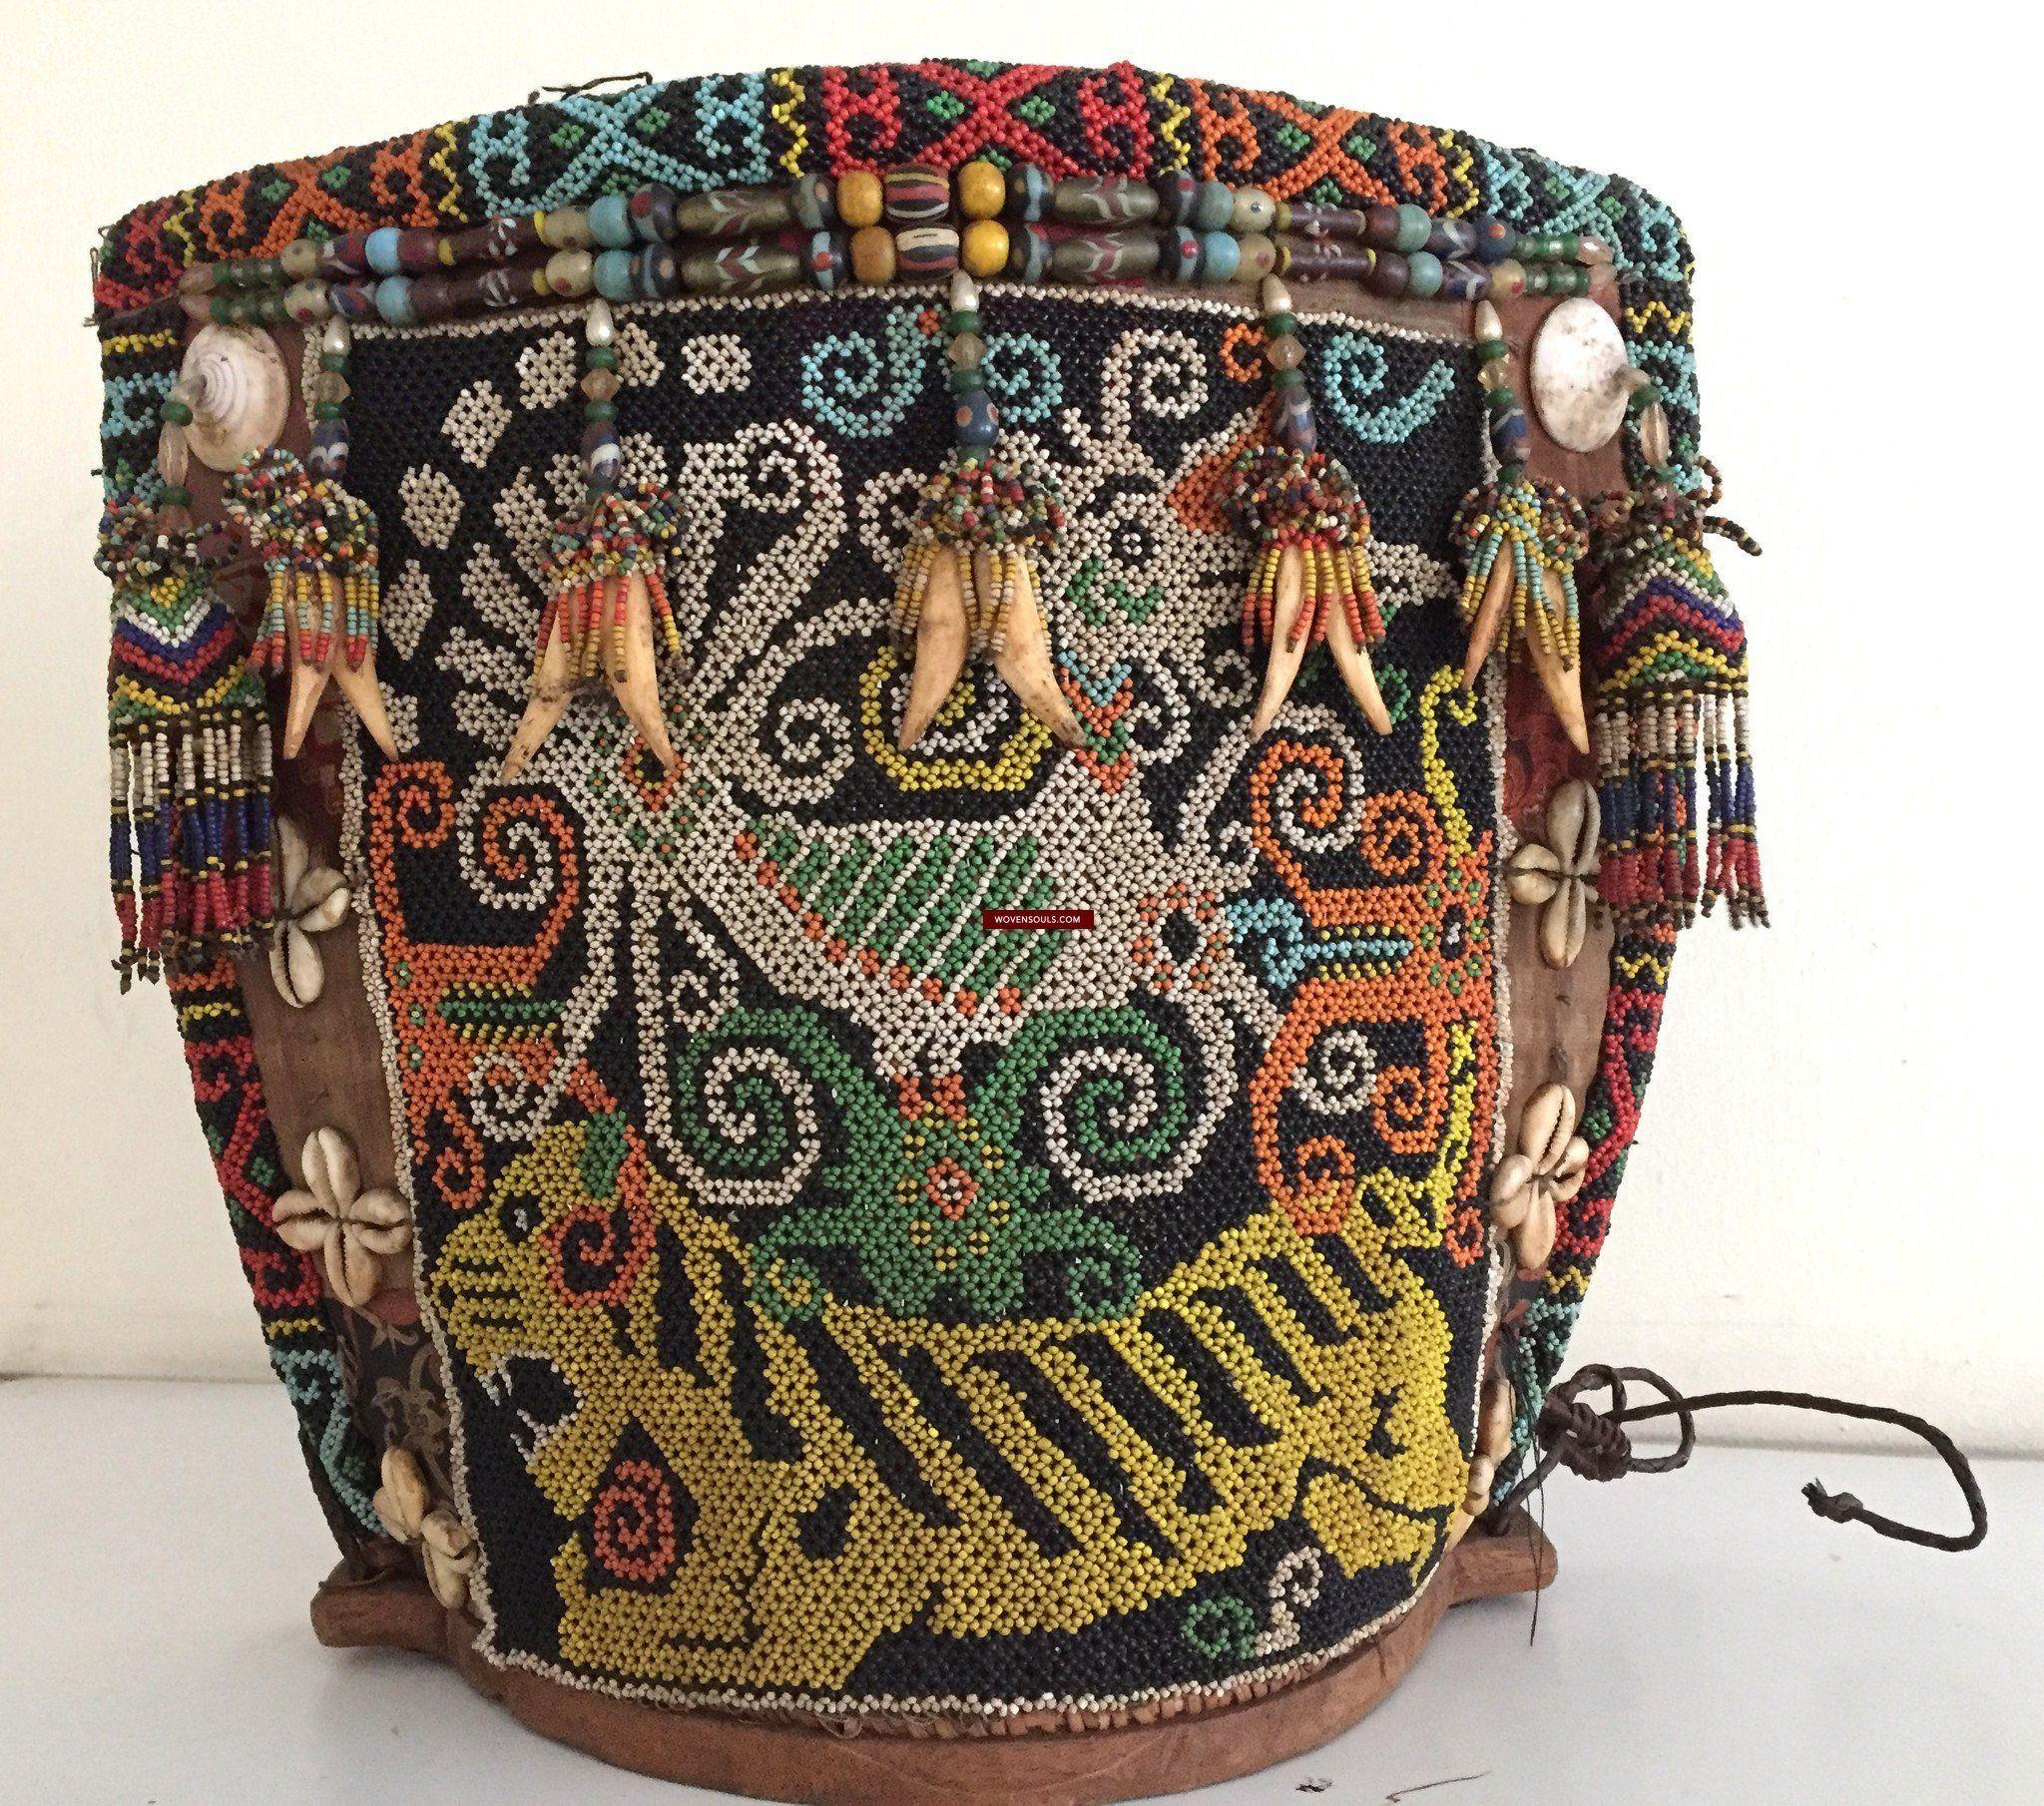 877 Antique KalimantanDayak Beaded Basket Baby Carrier